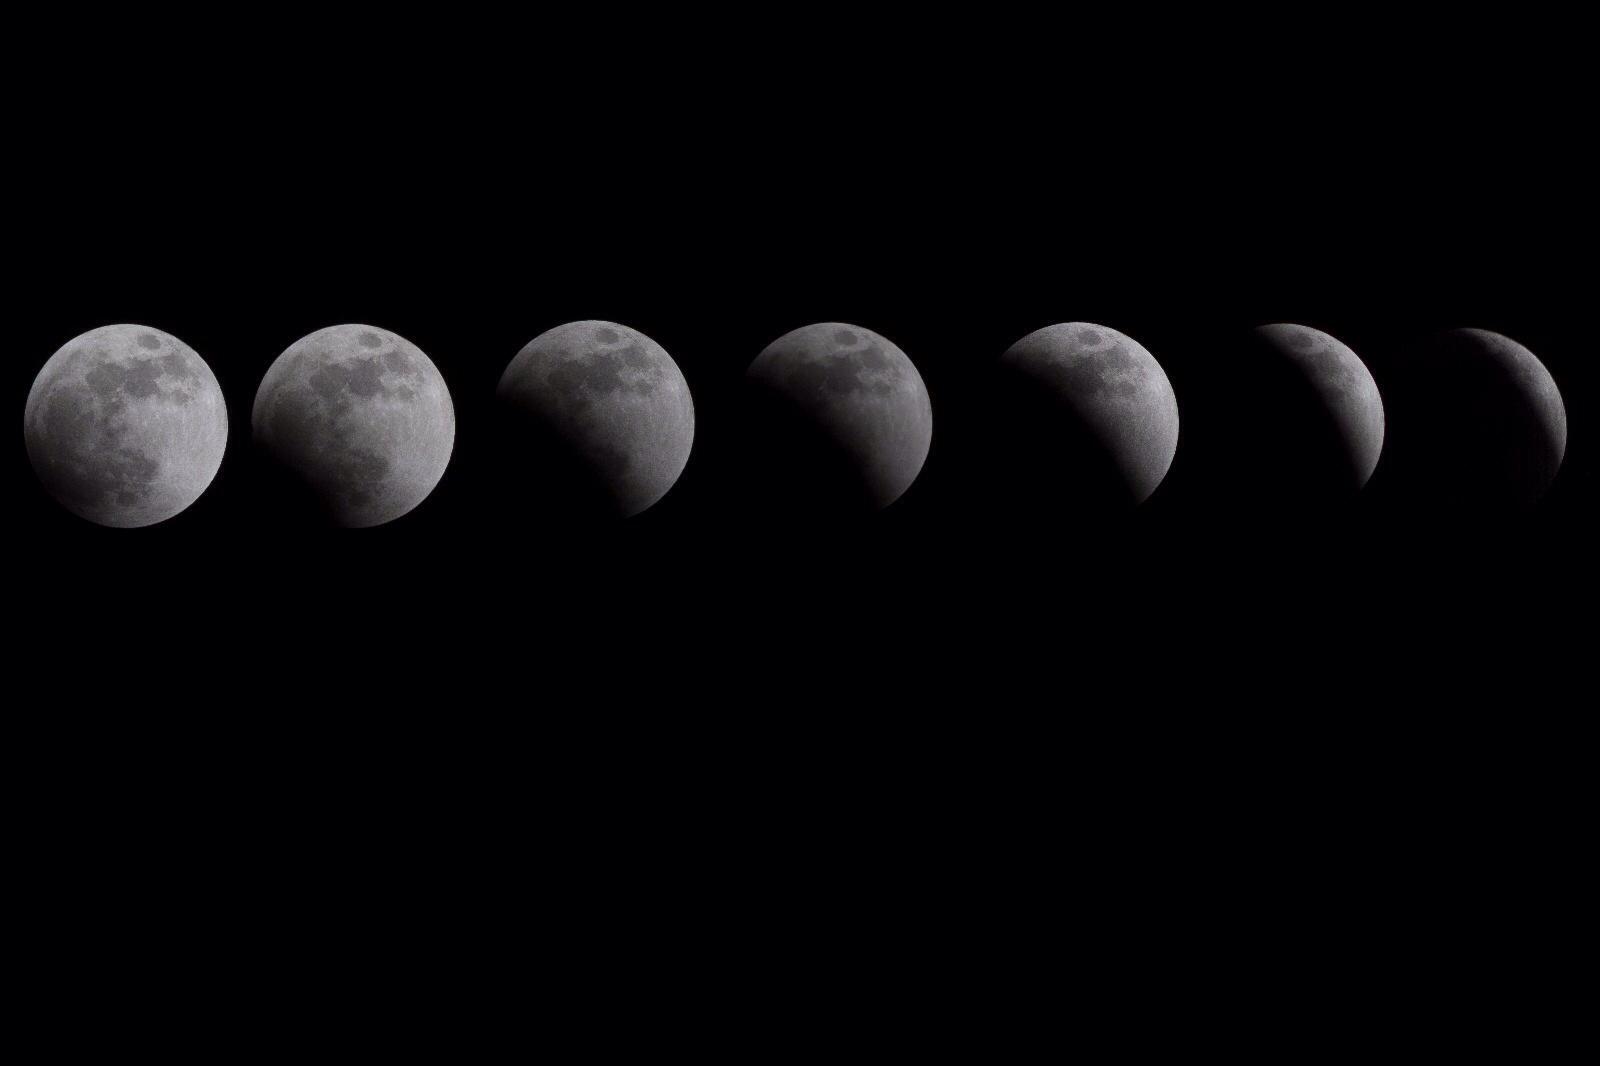 Luna 17